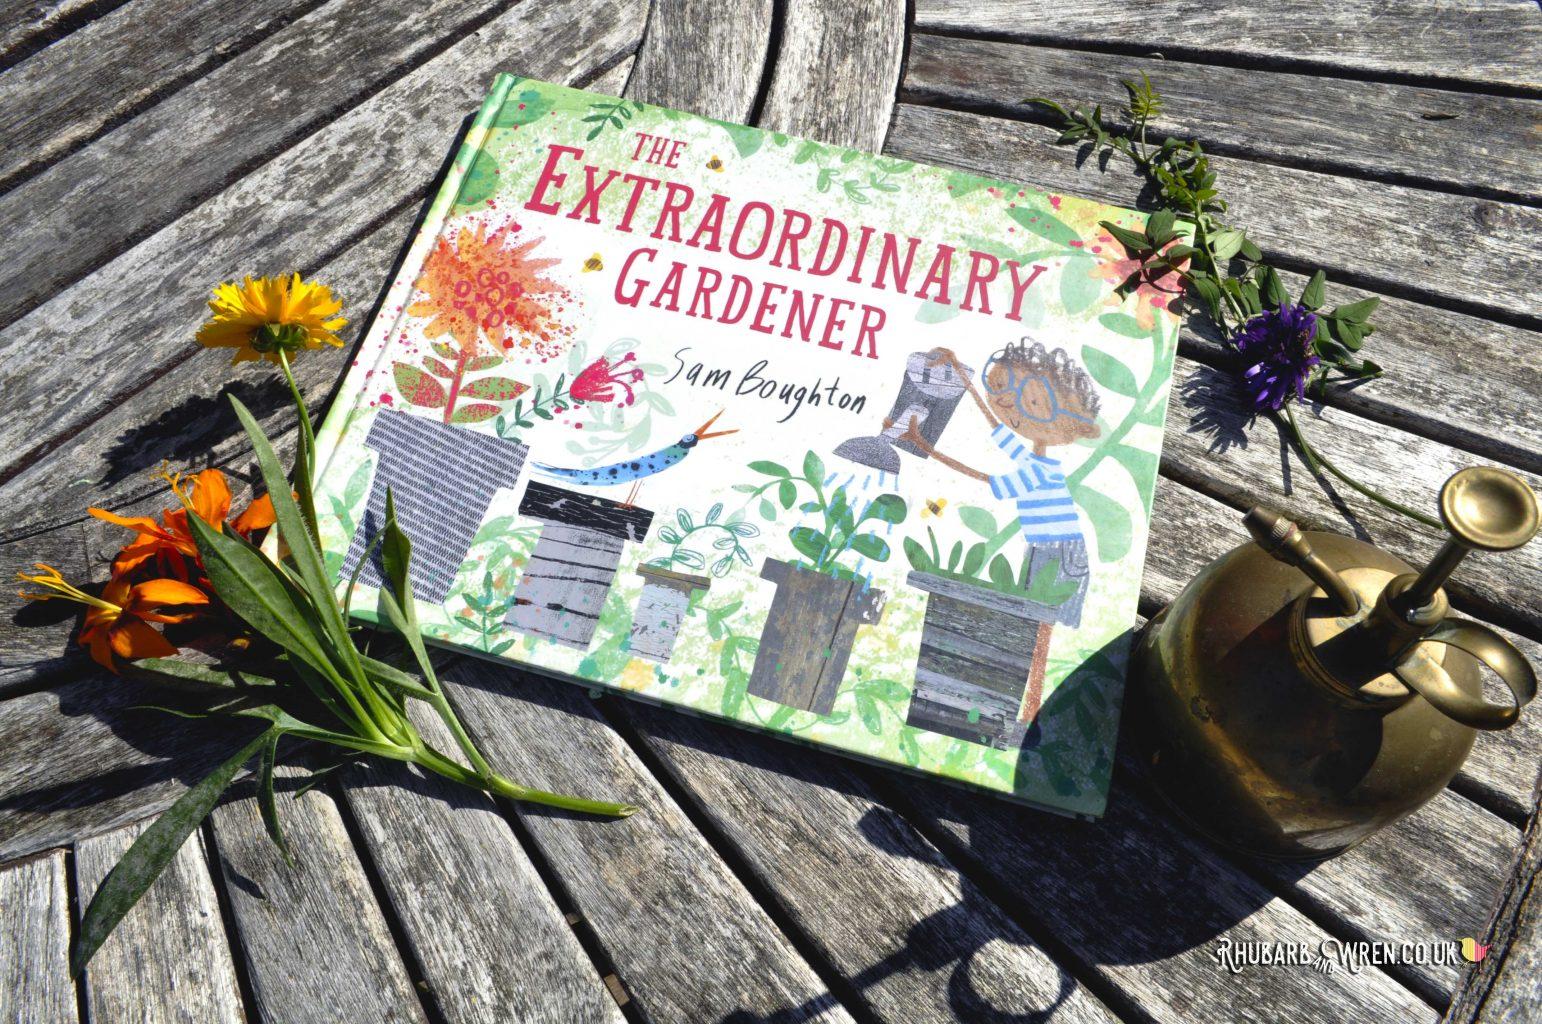 Children's picture book The Extraordinary Gardener by Sam Boughton